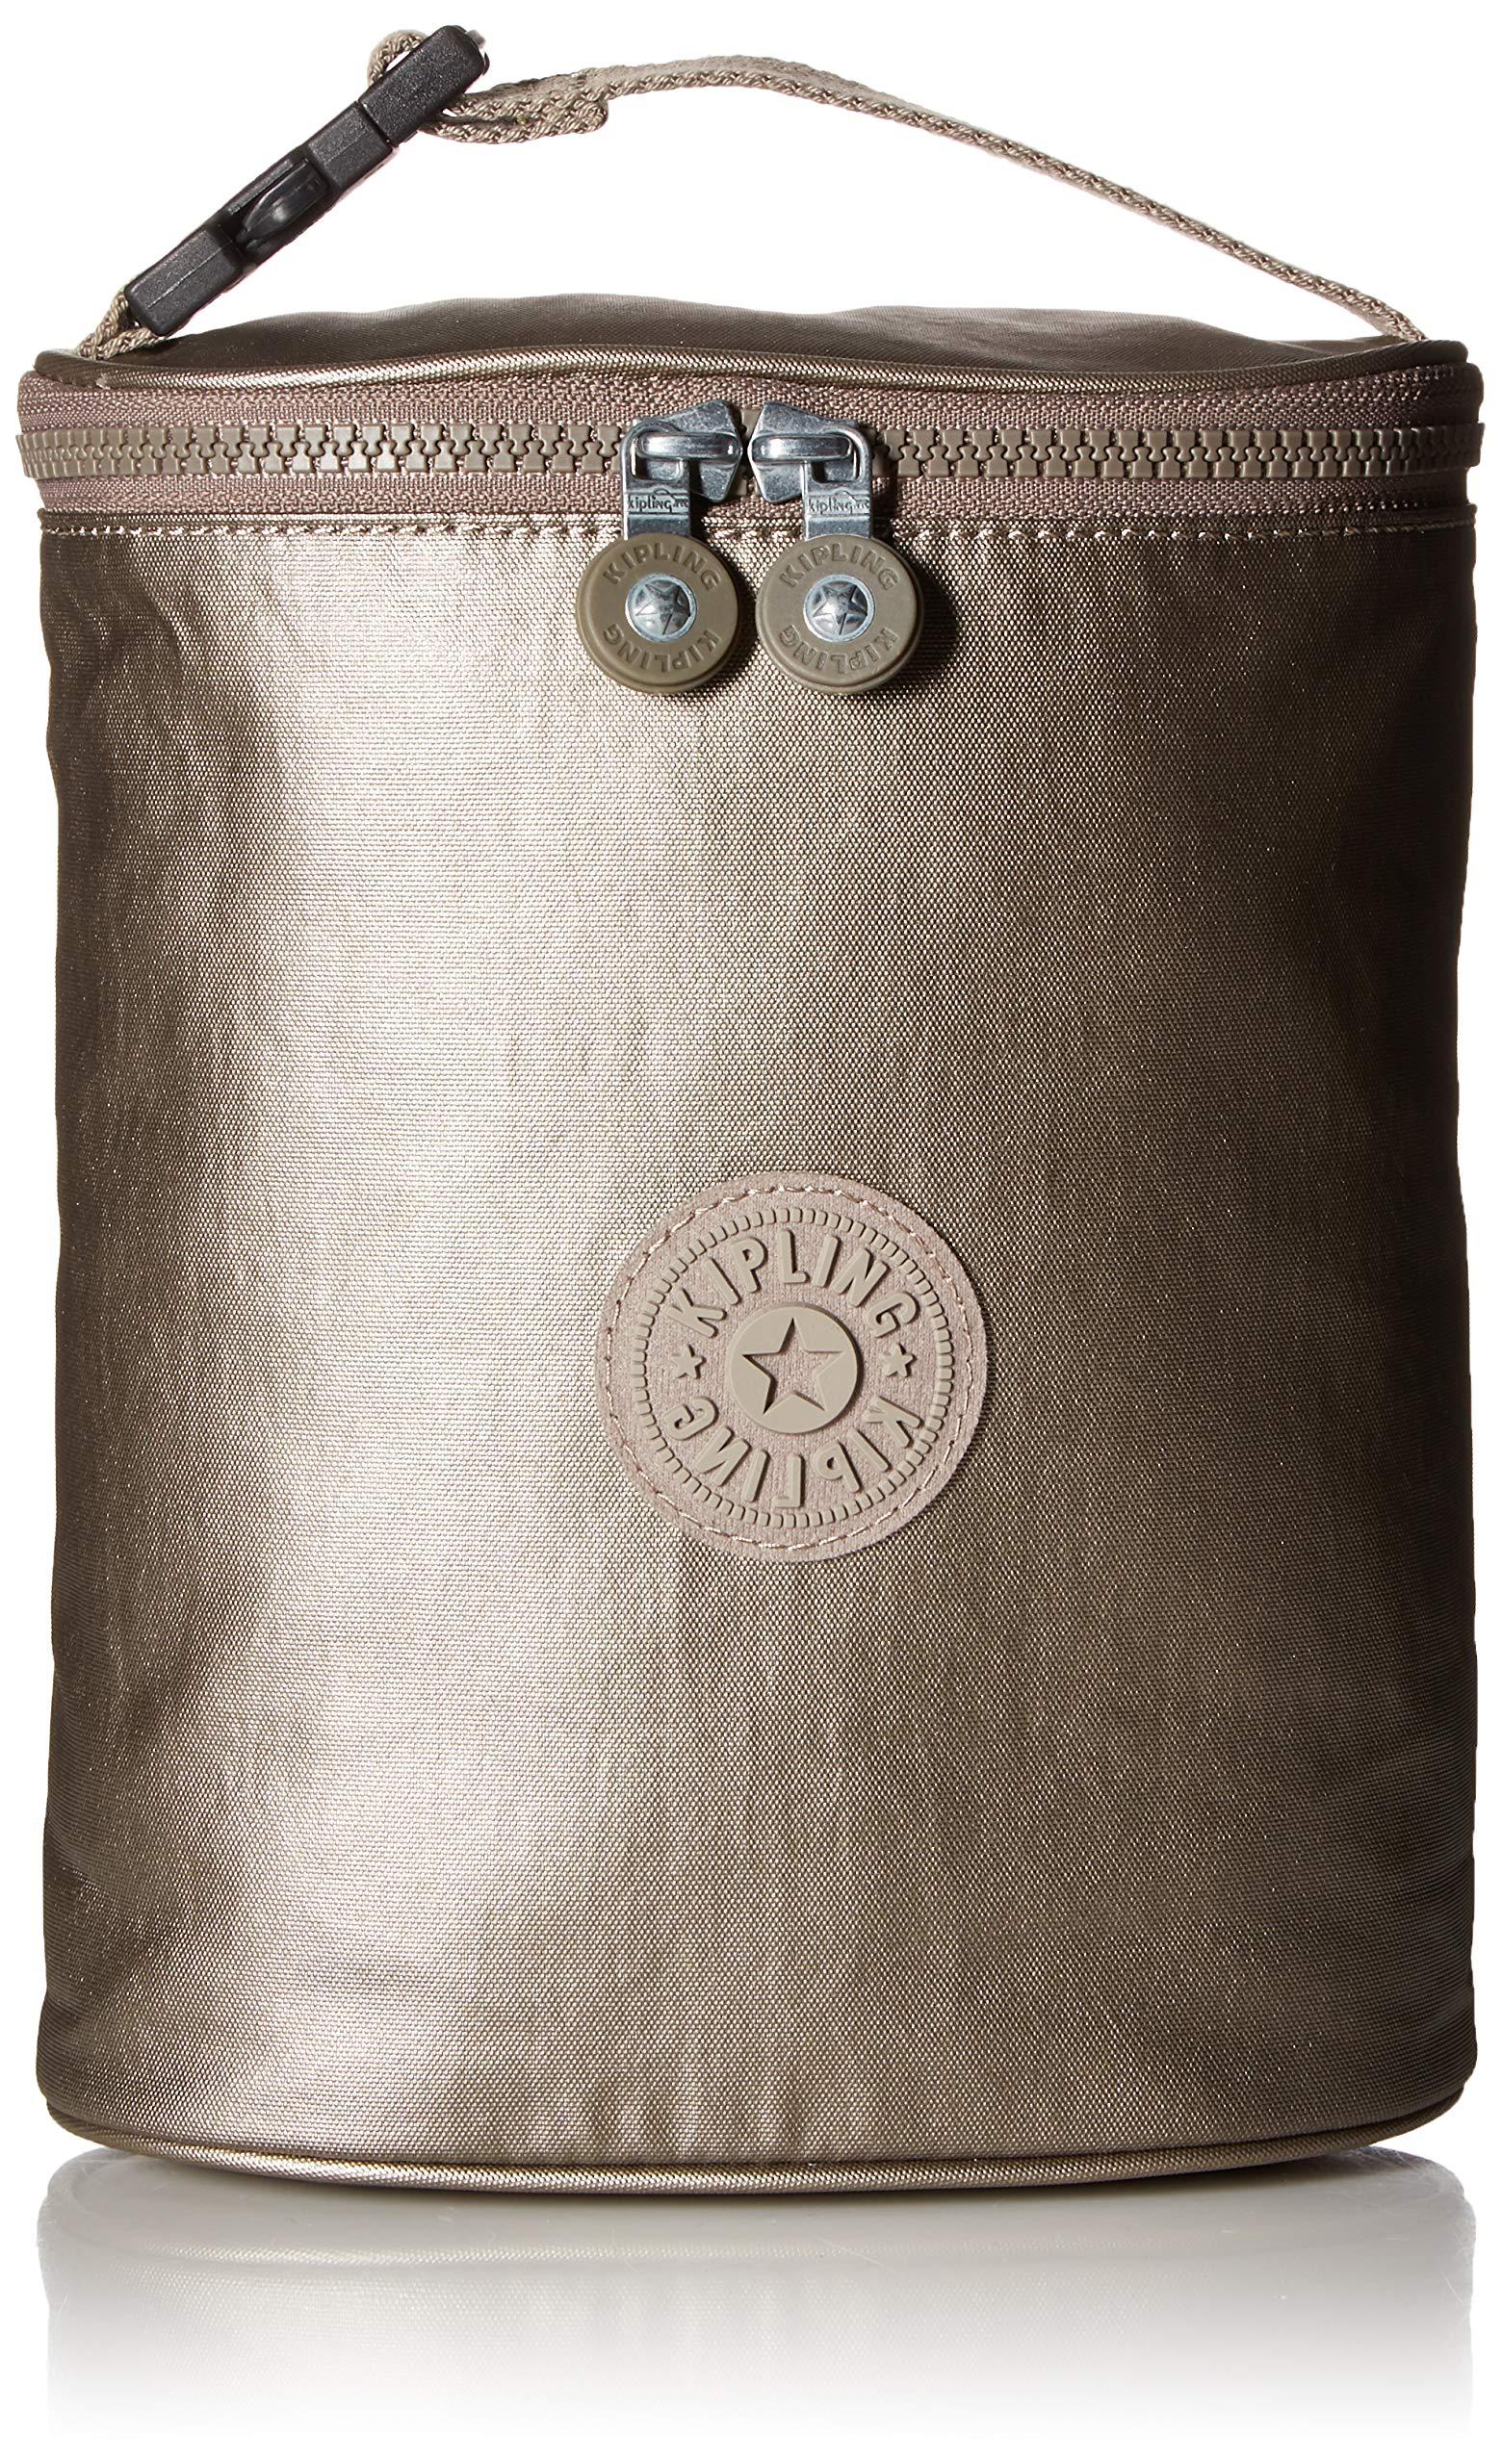 Kipling Insulated Baby Bottle Holder, Clip on Strap, Metallic Pewter by Kipling